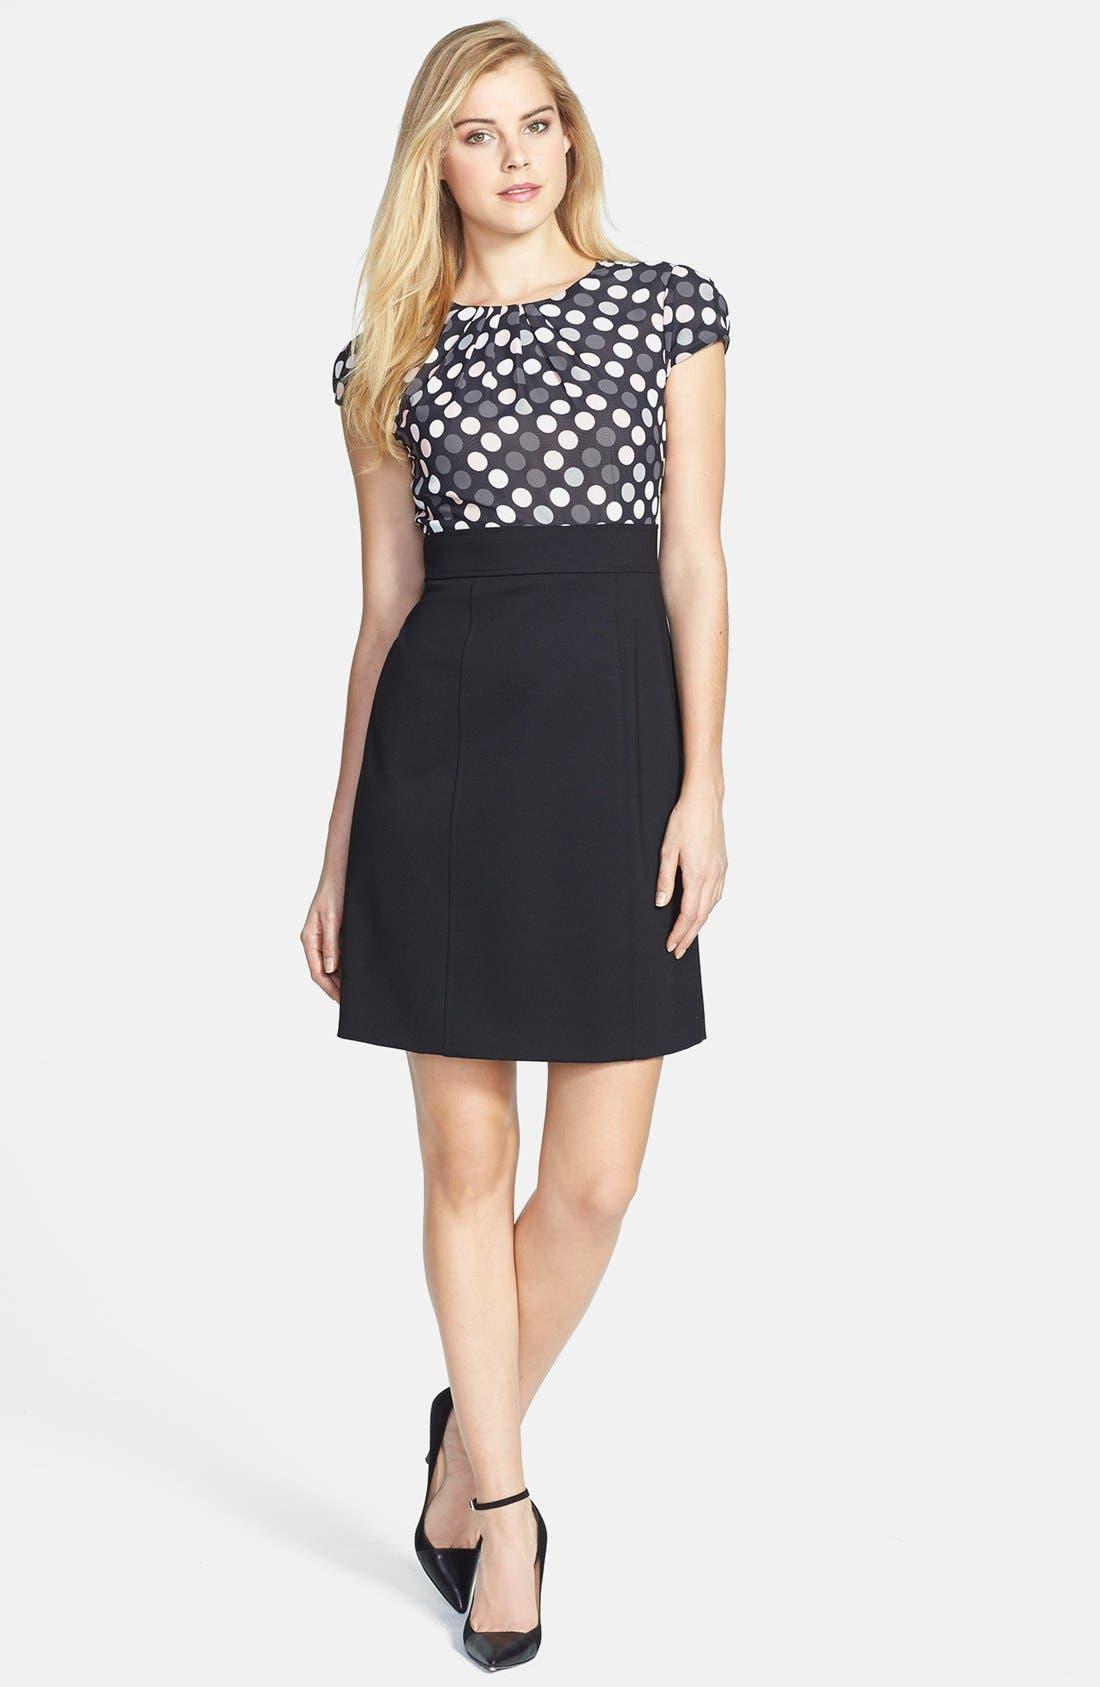 Alternate Image 1 Selected - Tahari Polka Dot Chiffon & Crepe Sheath Dress